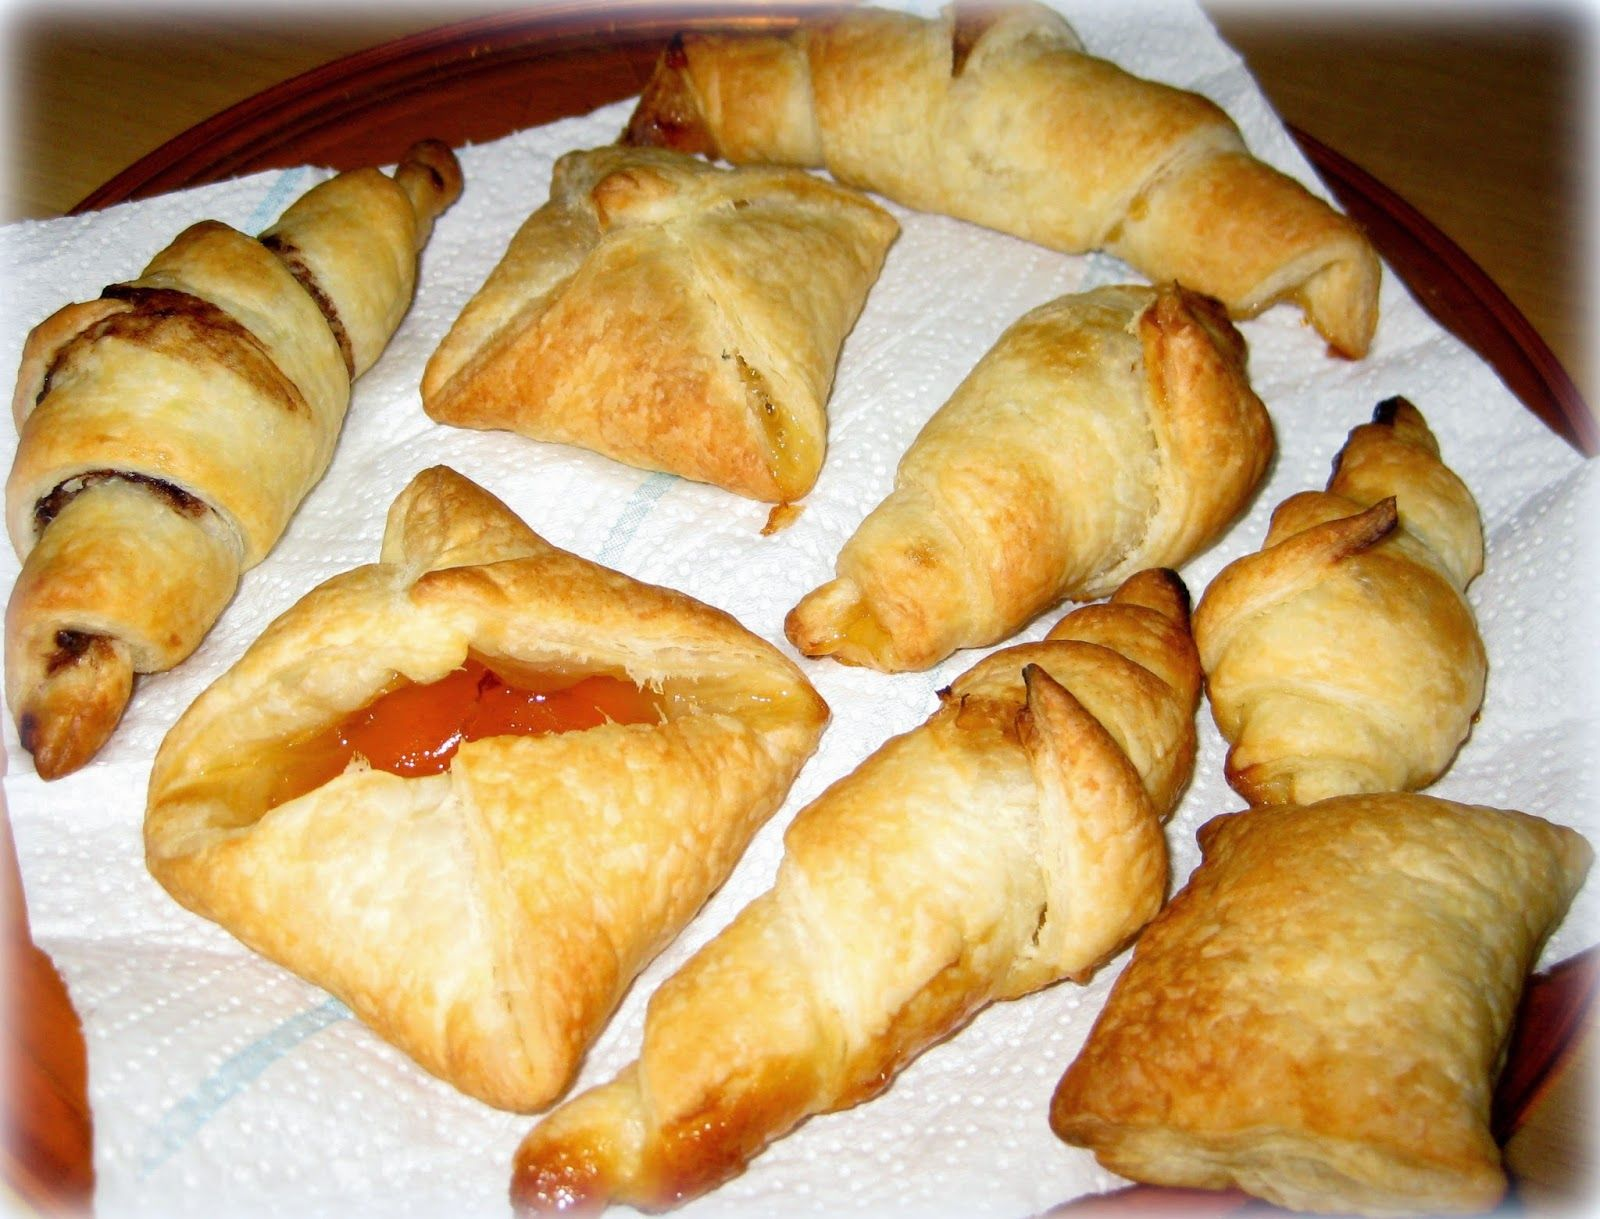 Italian Sfoglia Cake Recipes: Pasta Sfoglia - Puff Pastry